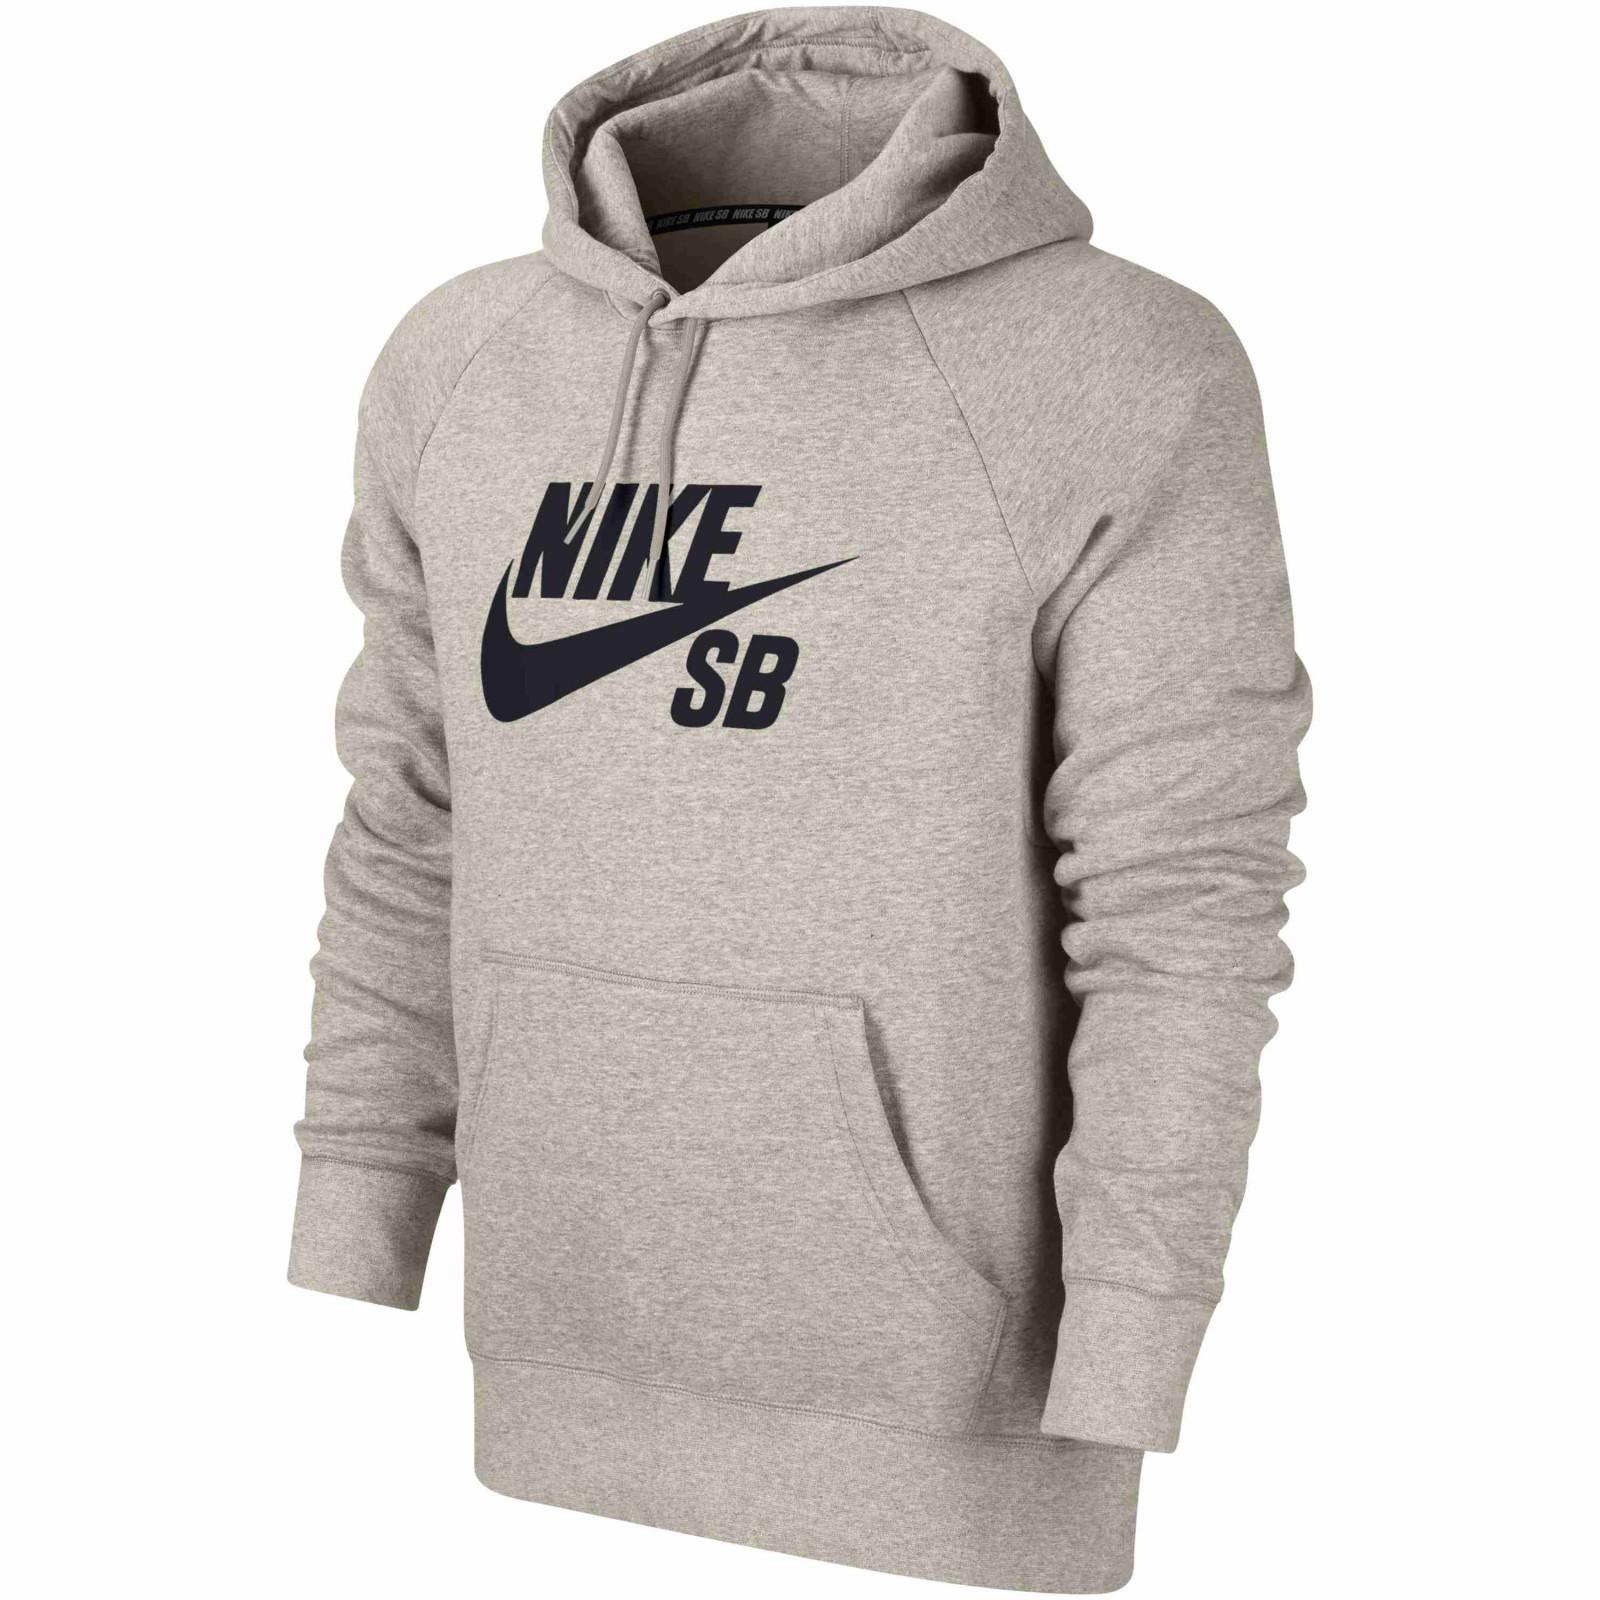 e27fbe18f9a Pánská mikina Nike SB ICON PO HOODIE